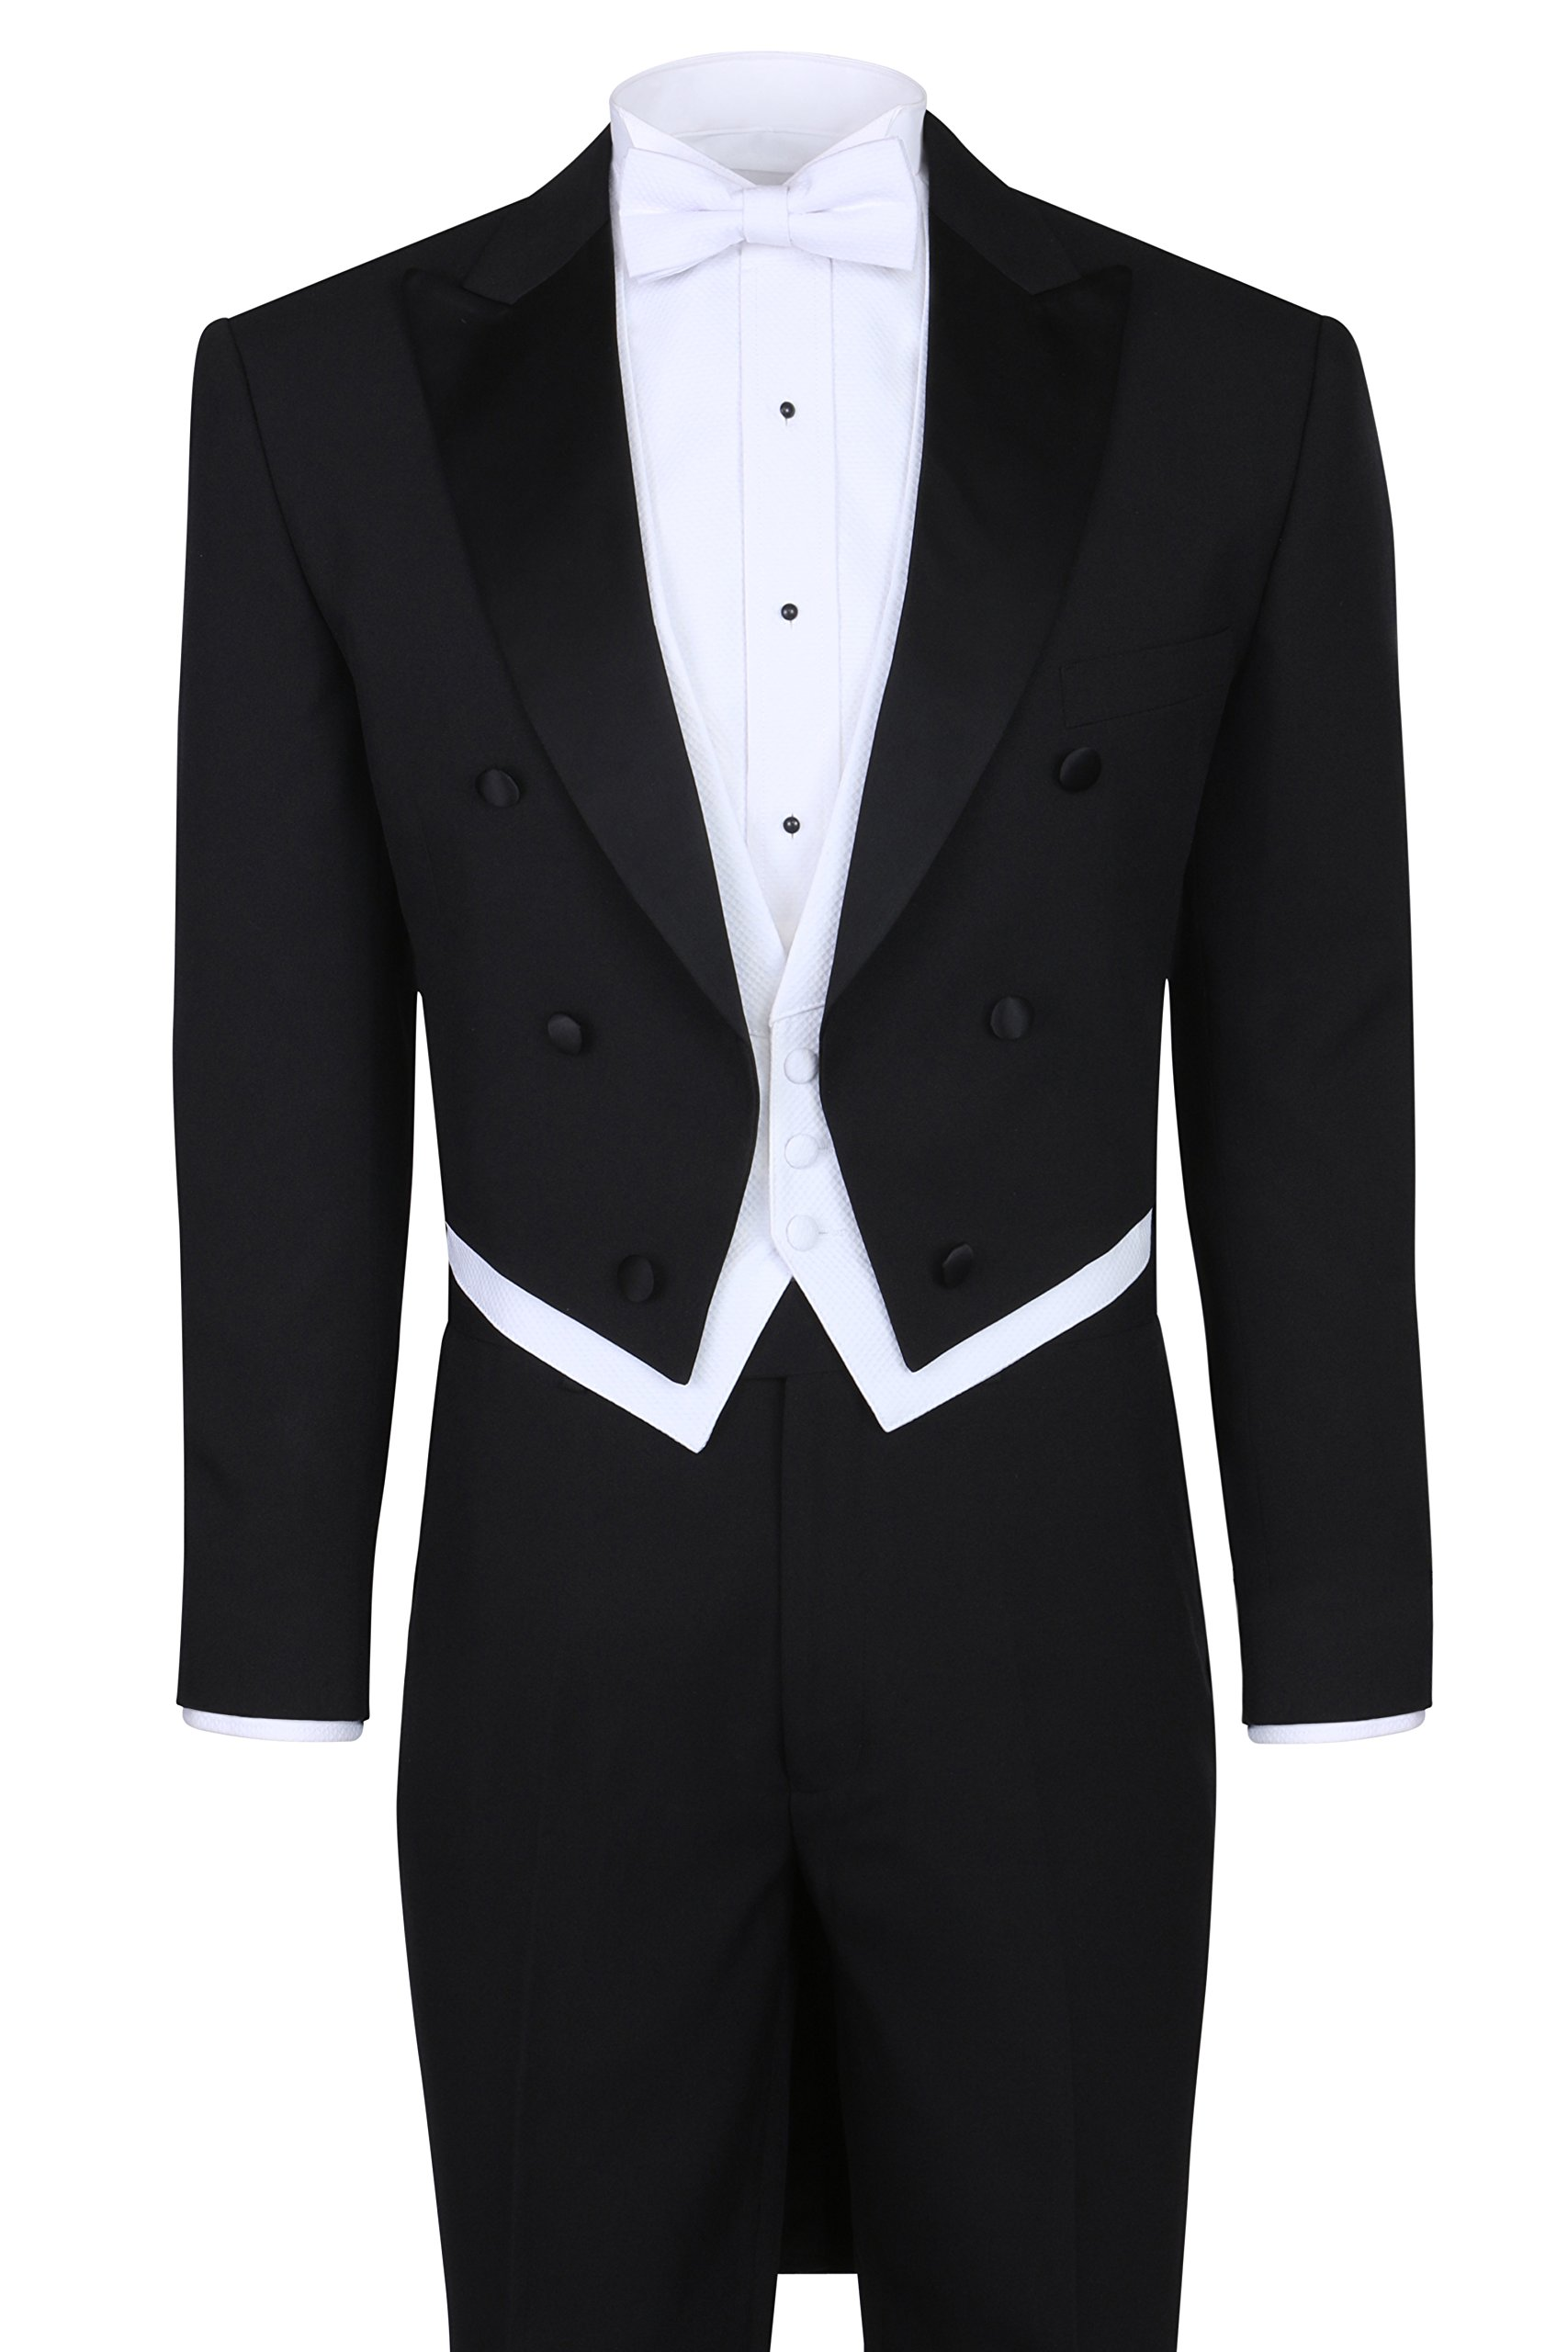 S.H. Churchill & Co. Black Tailcoat Tuxedo & Tuxedo Pants - 38 Long